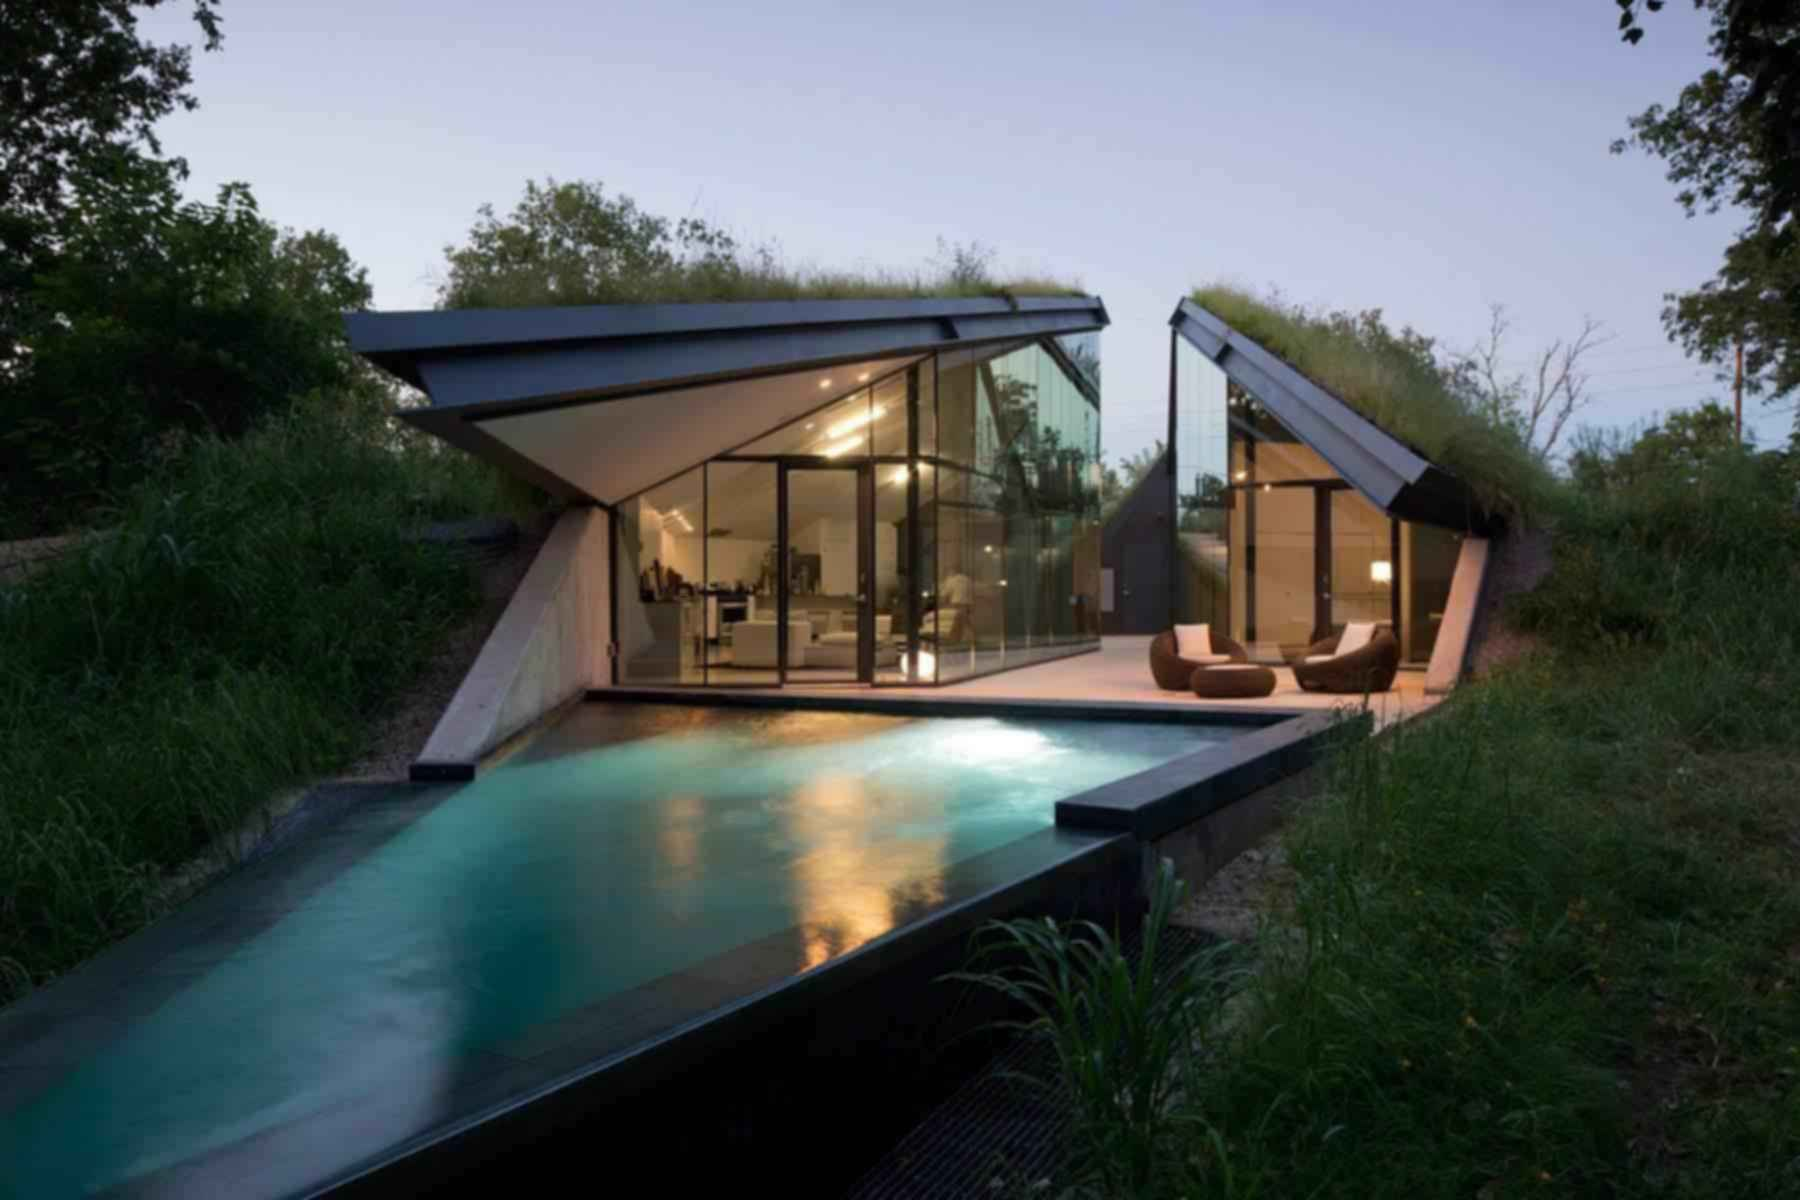 Edgeland House - Exterior/Pool